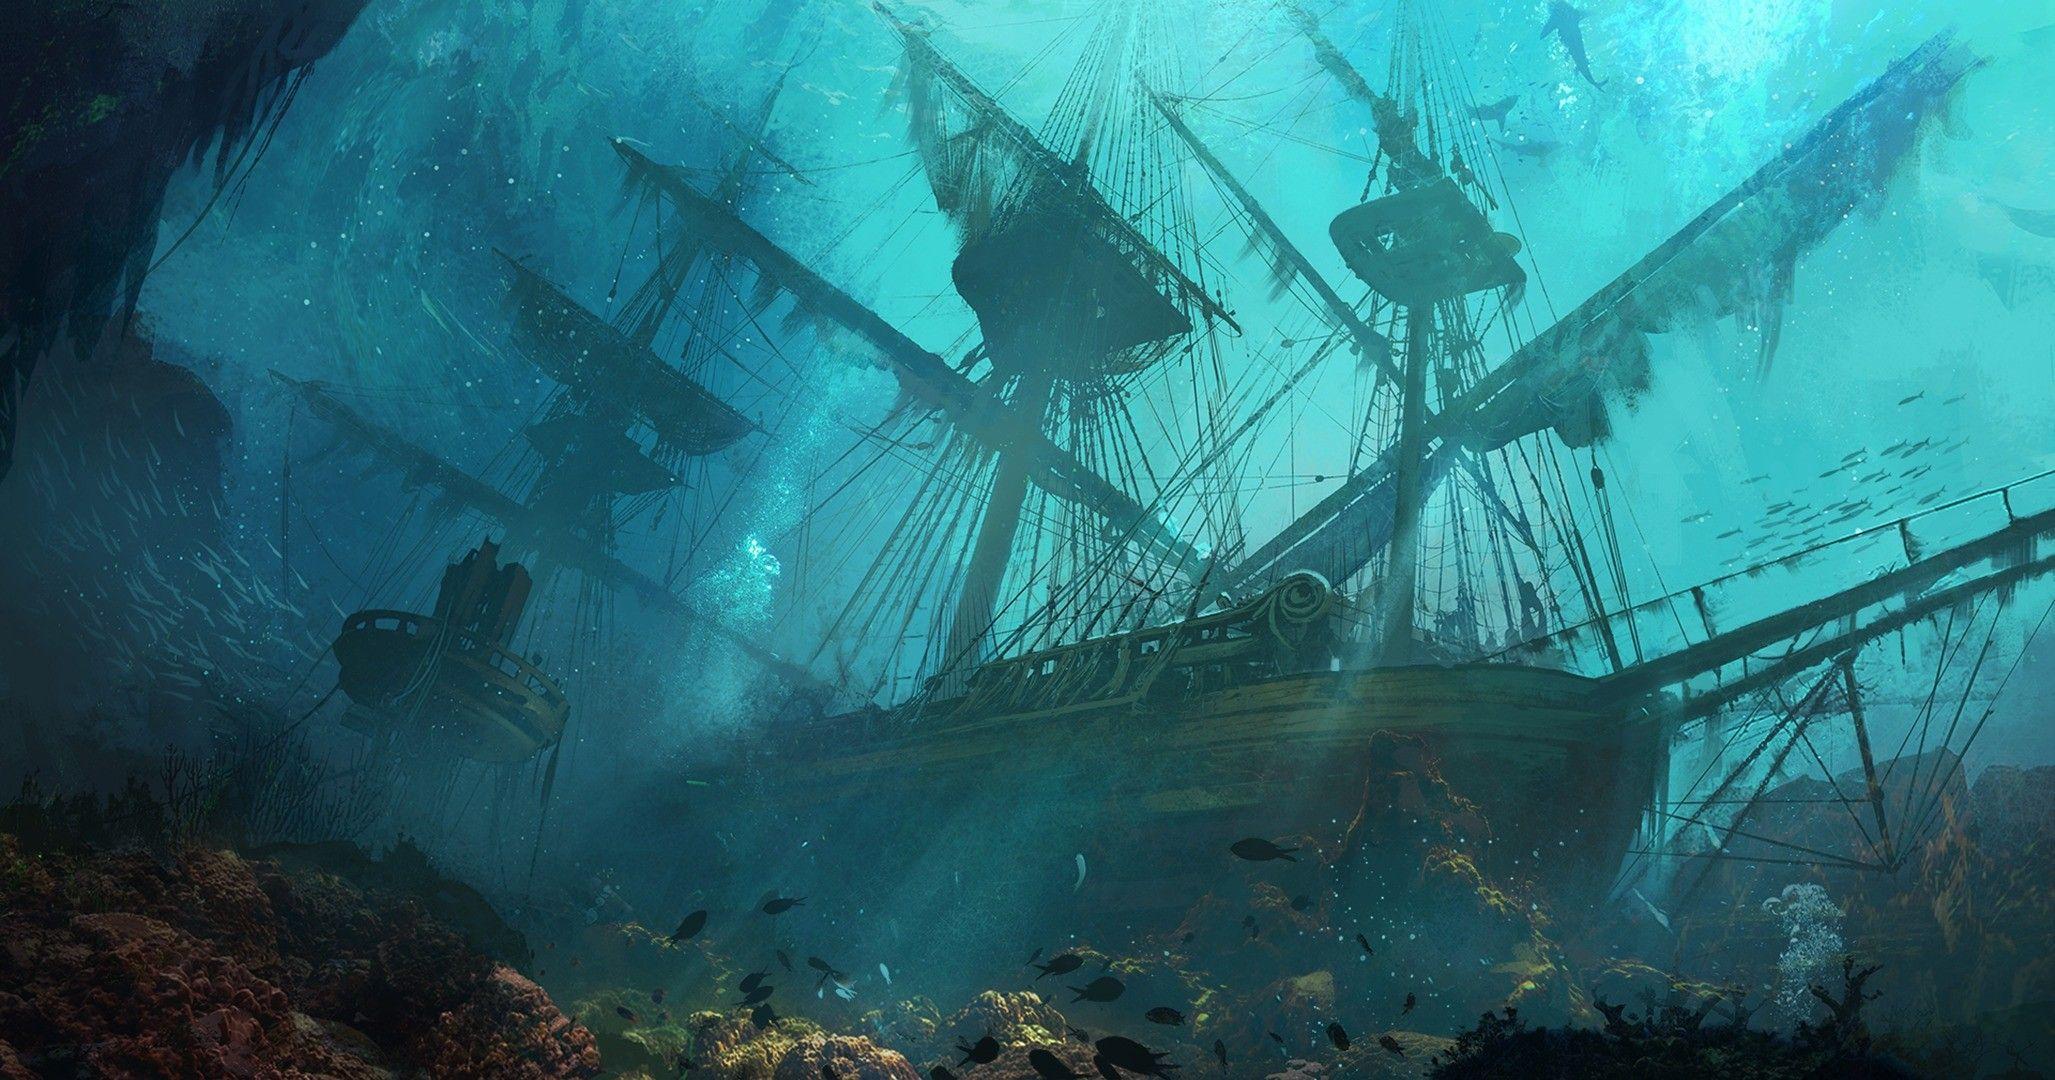 Fantasy ship cliff jolly roger pirate ship rock lightning wallpaper - General 2055x1080 Sinking Ships Ship Drawing Sea Fantasy Art